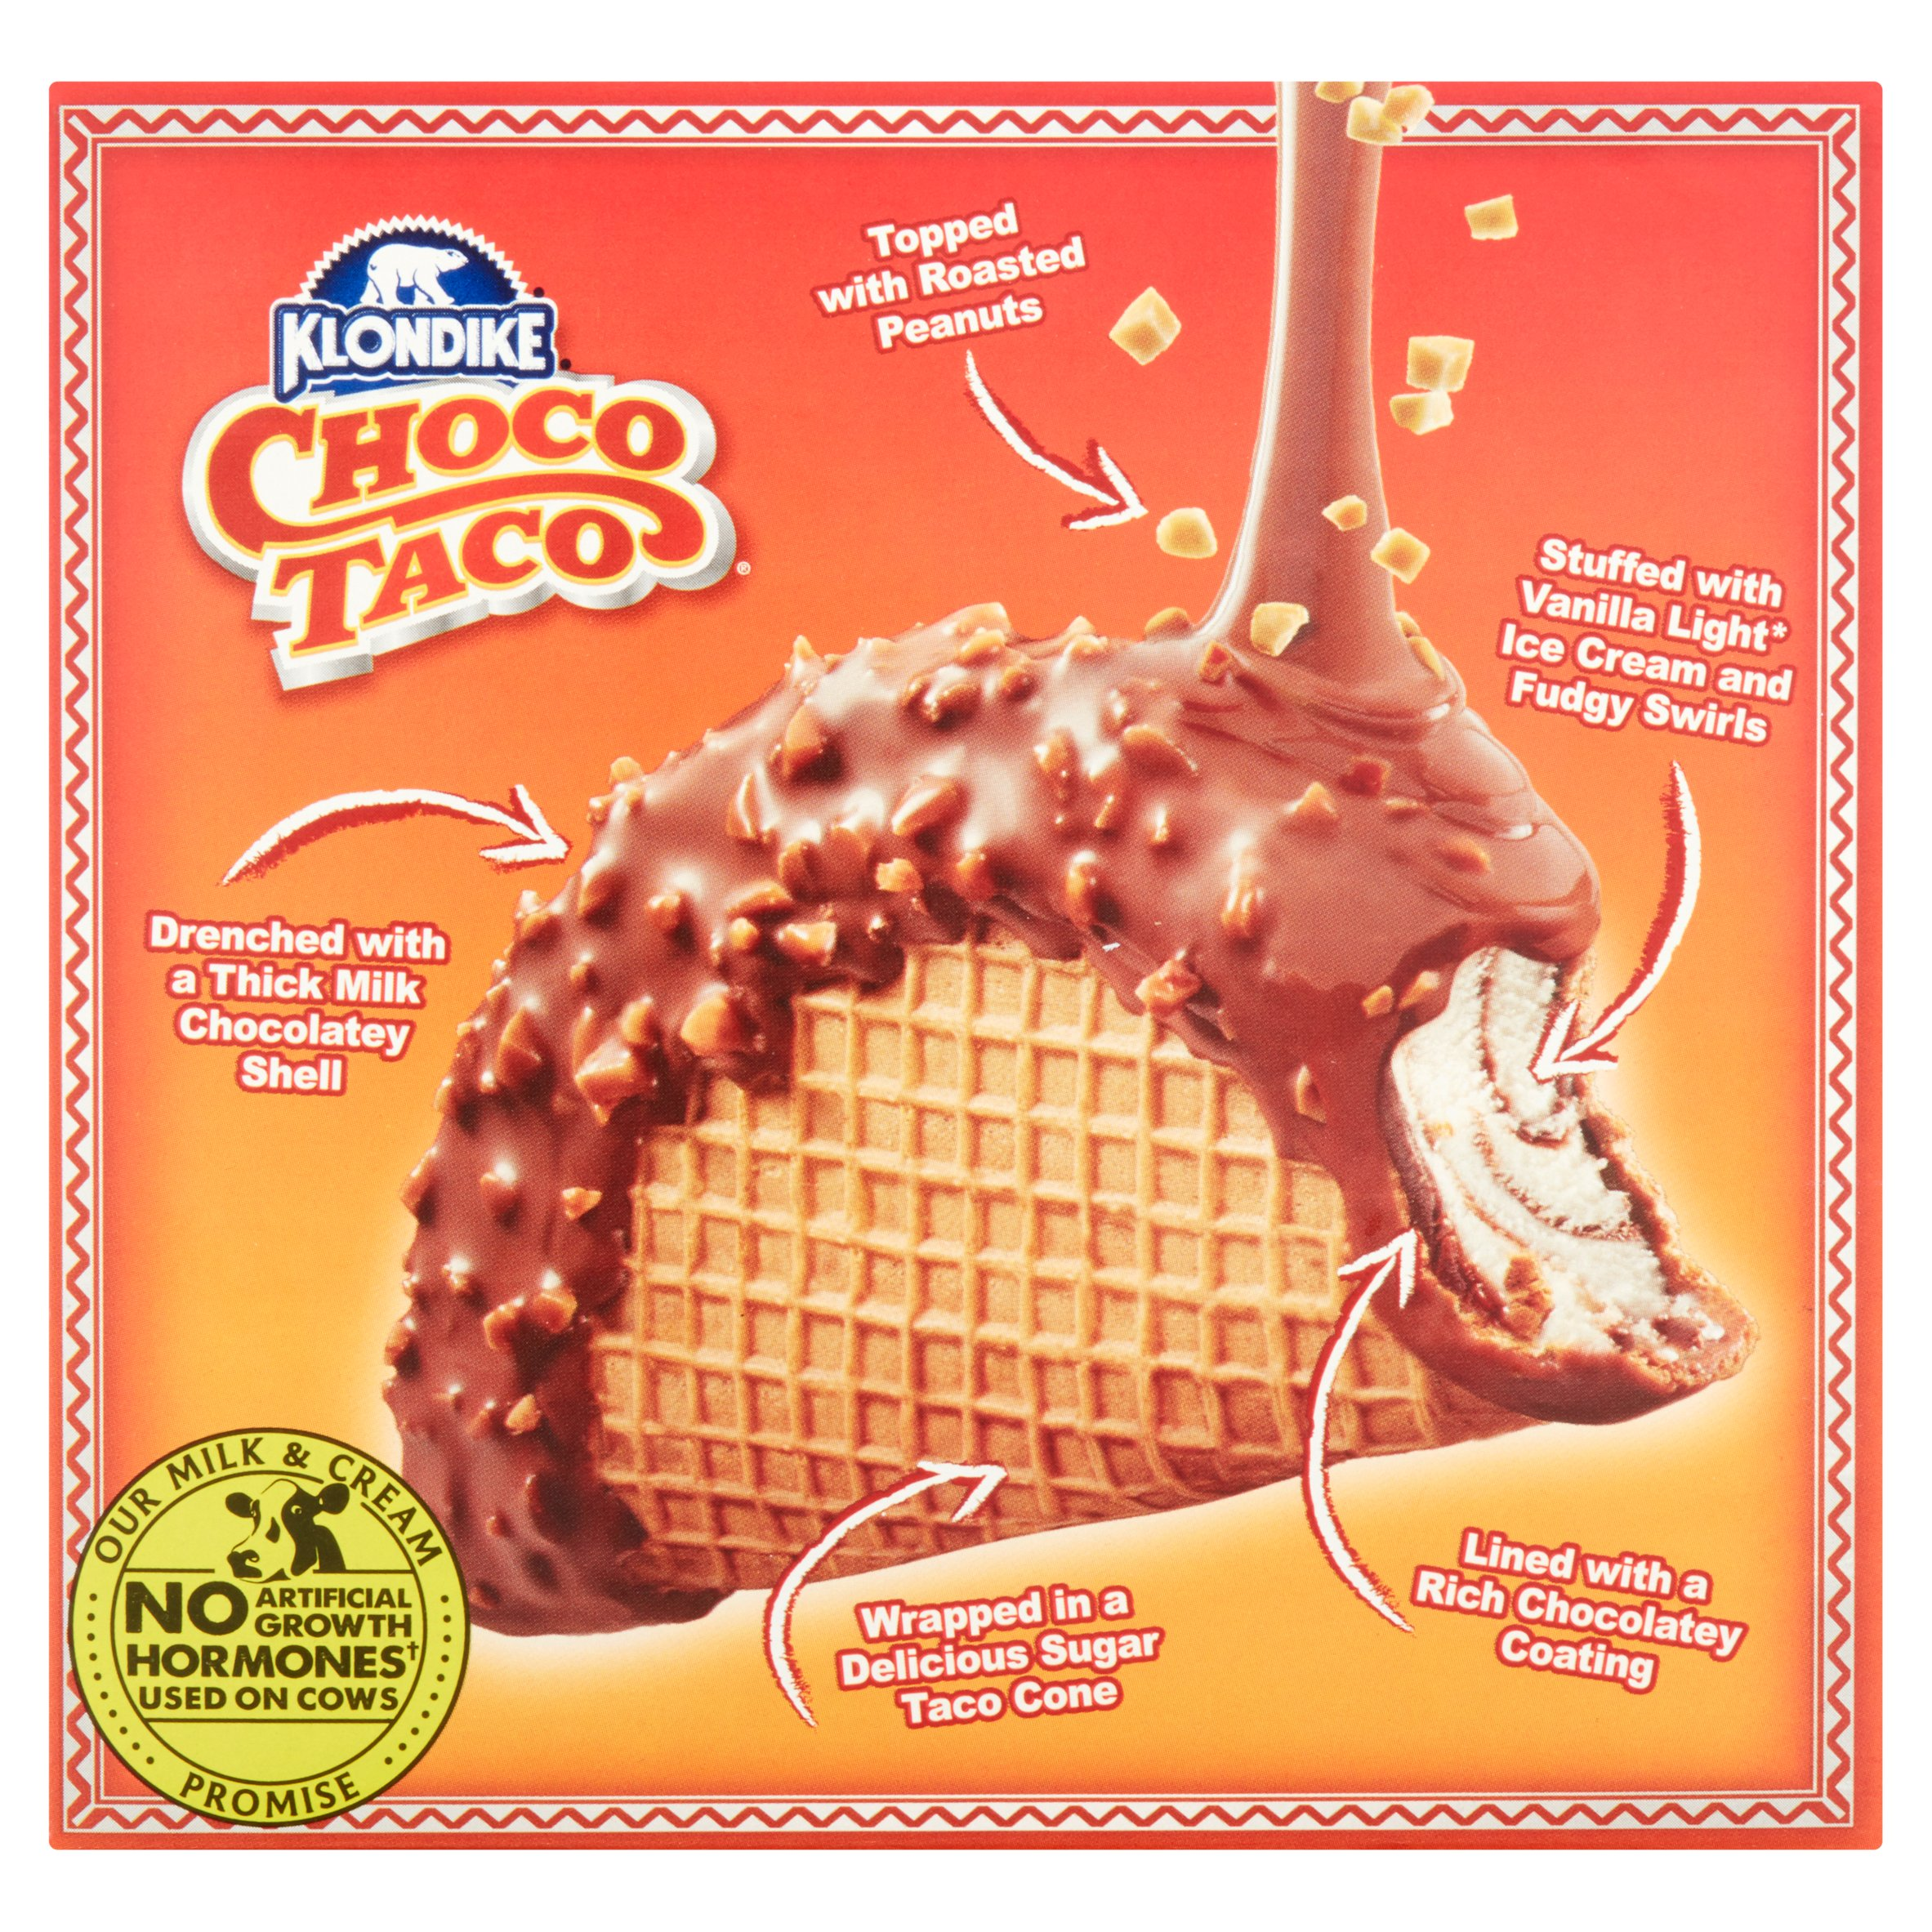 klondike choco taco the original light ice cream taco cones 3 5 fl